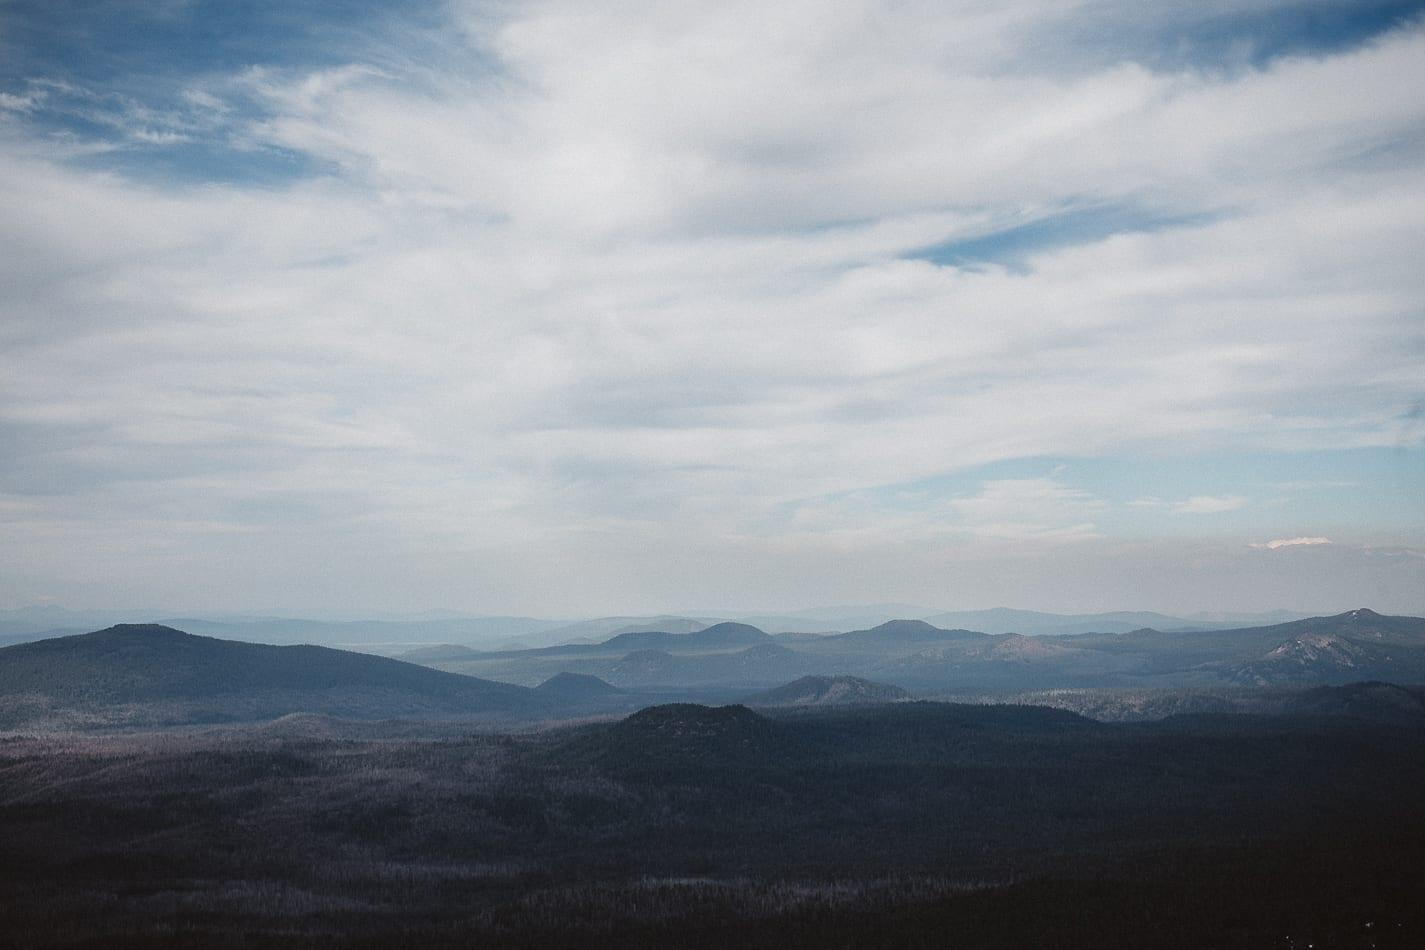 mount-lassen-california-adventure-lifestyle-photorapher-18